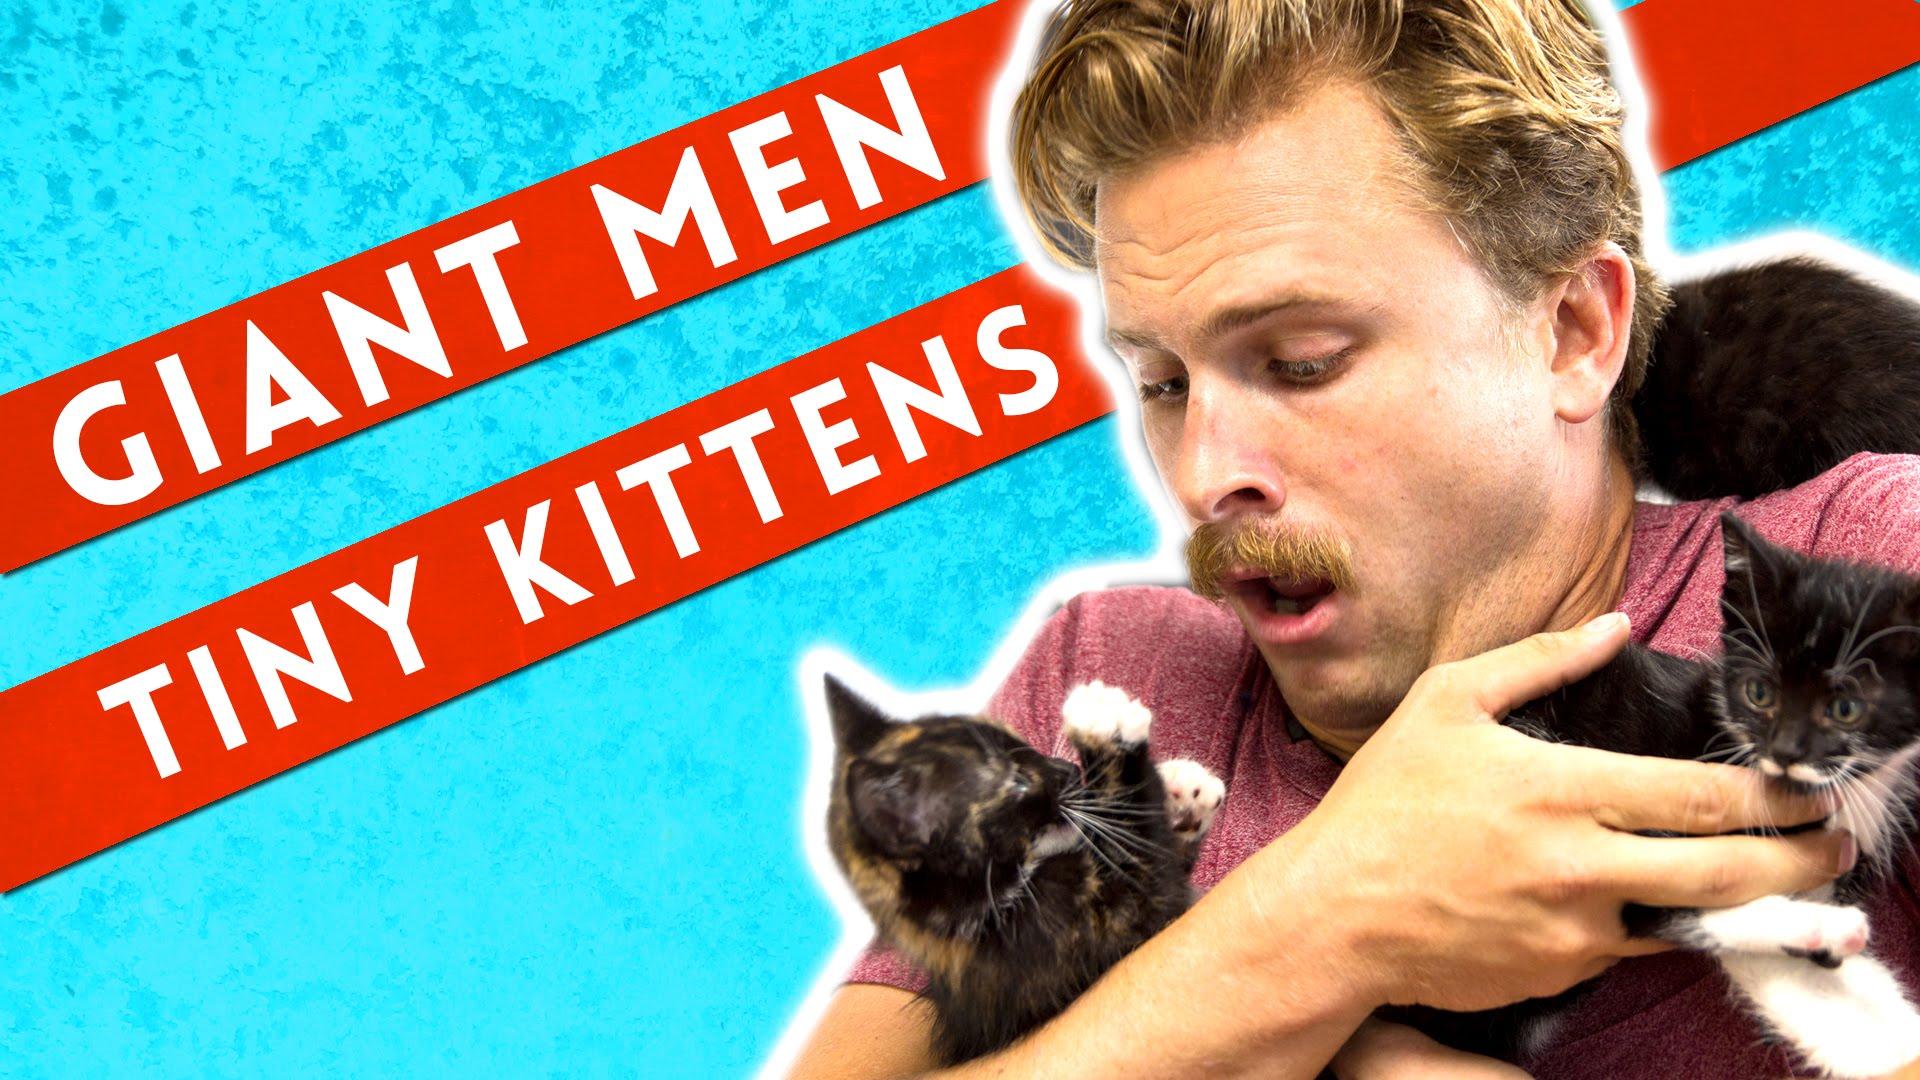 BuzzFeed kittens